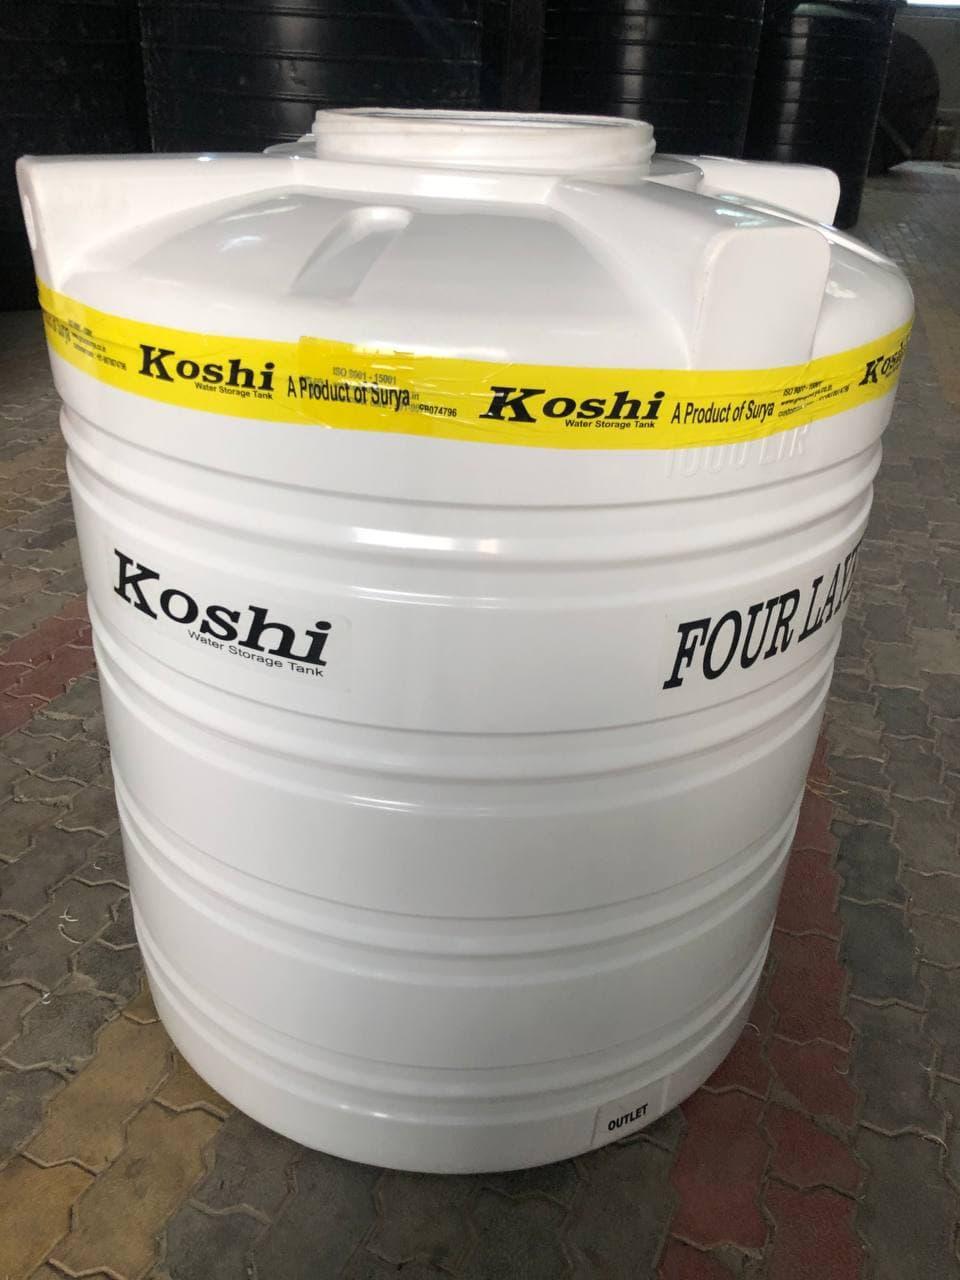 KoshiPlast Water Storage Tanks Manufacturer (5000 ltr)_2